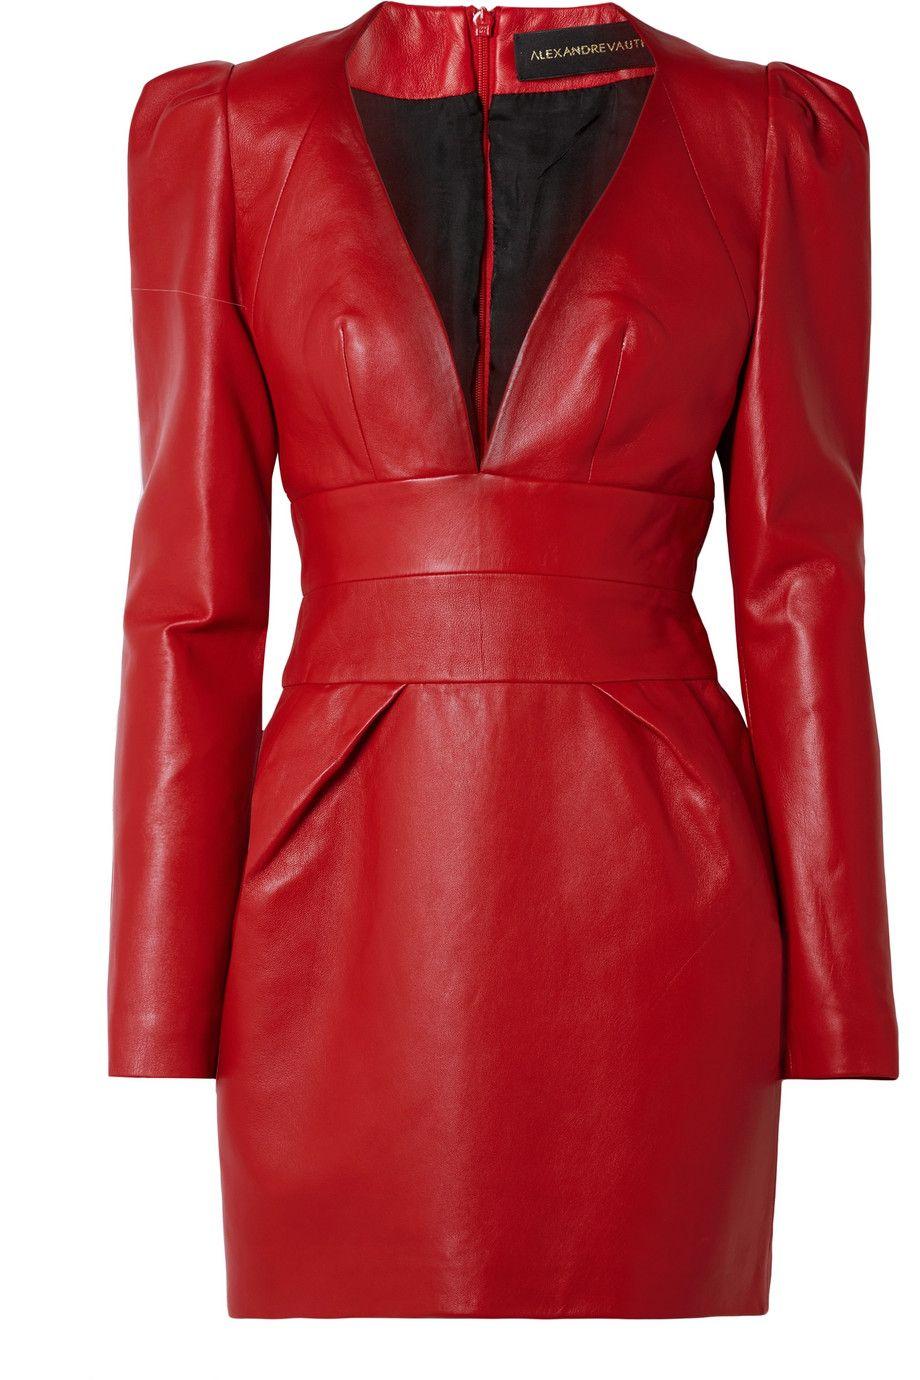 c1adfeb54493 Alexandre Vauthier   Leather mini dress   NET-A-PORTER.COM   casual ...